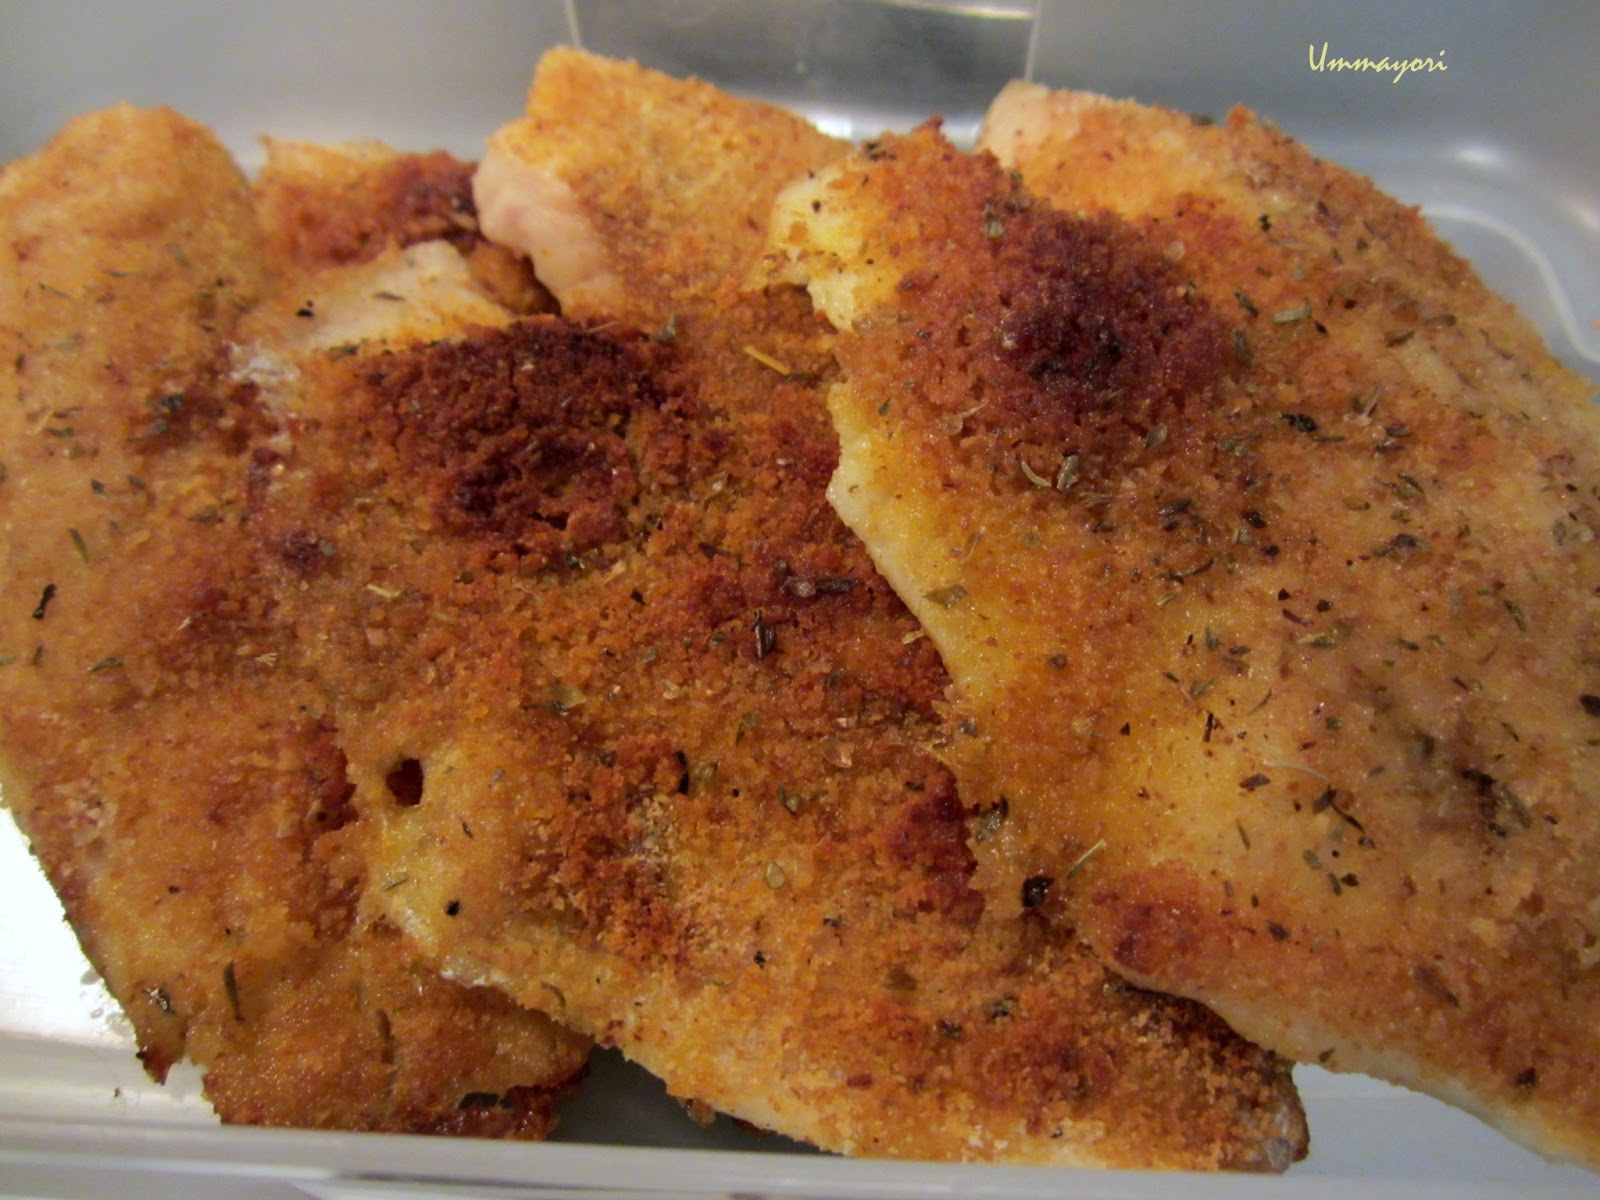 Umma yori oven baked tilapia for How to bake tilapia fish